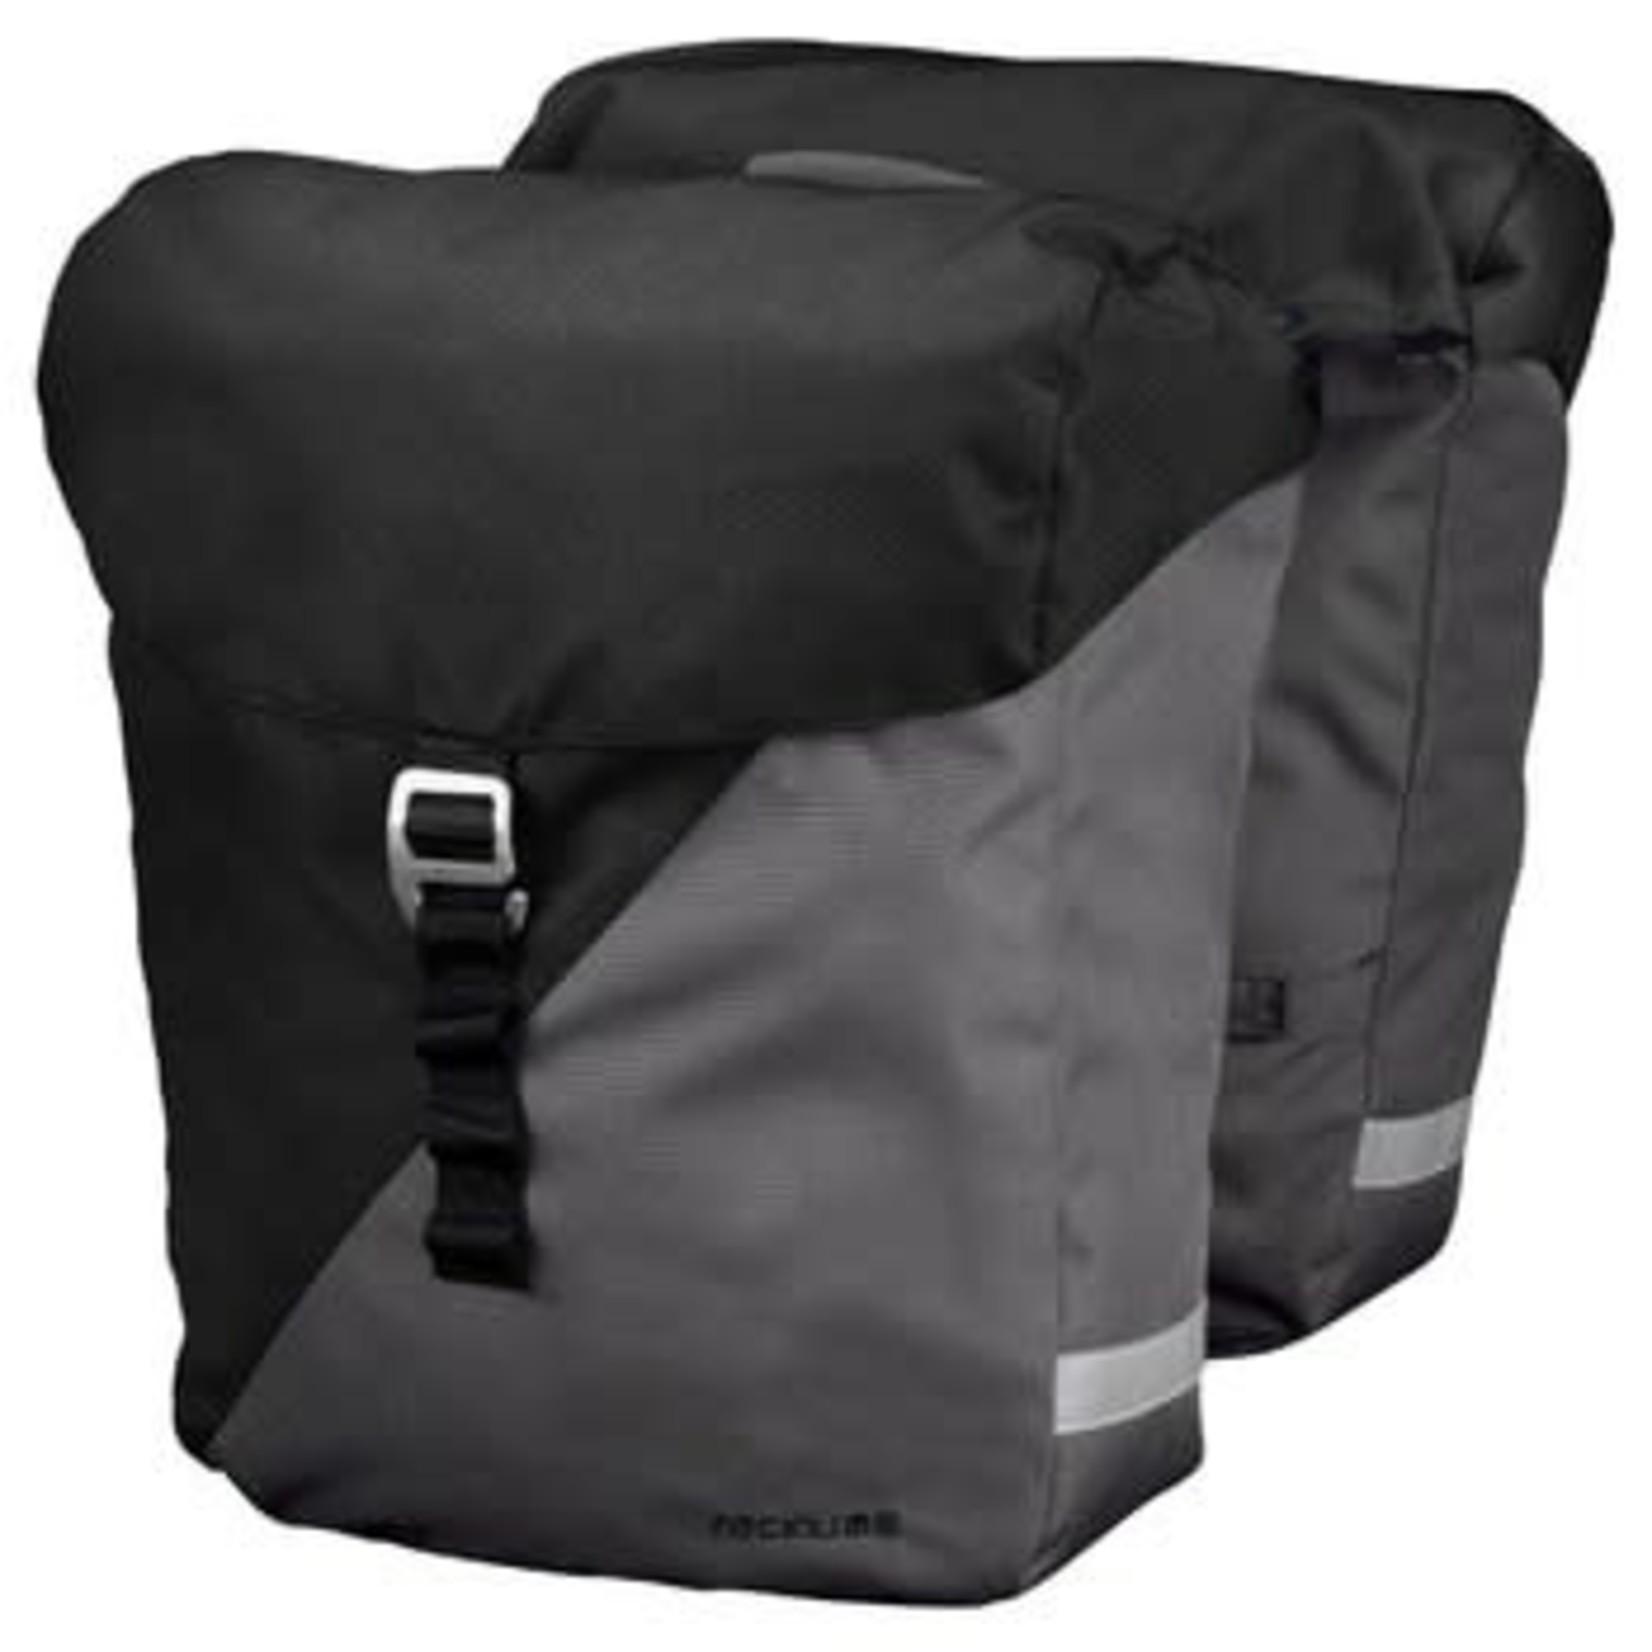 RACKTIME Racktime VIDA Hintenrad Taschen Double Bag carbon black /stone grey - 24;5L